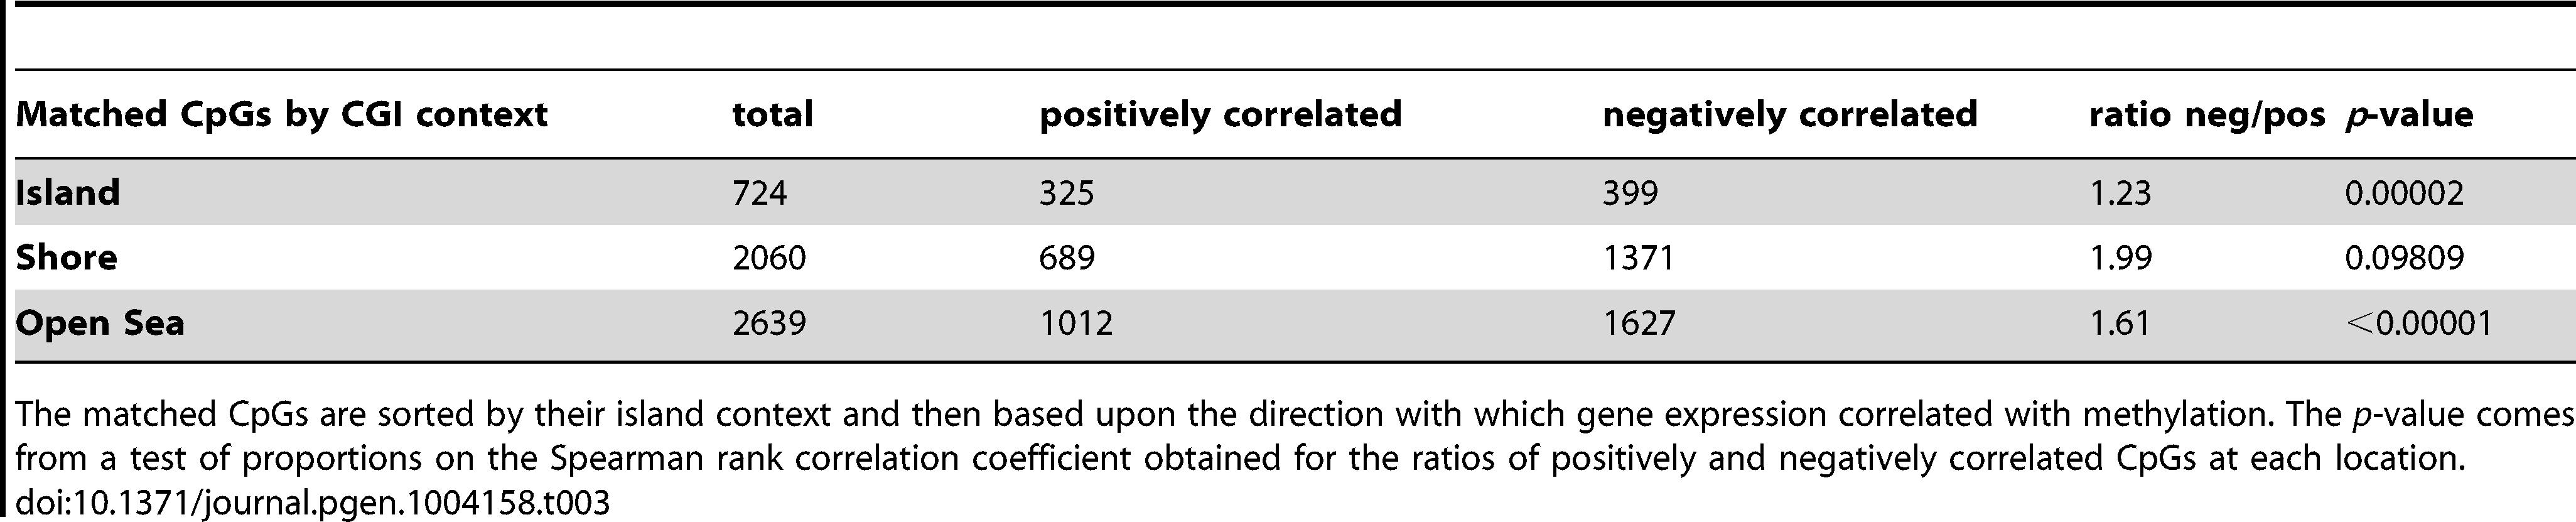 Correlation of methylation with gene expression based on island context.